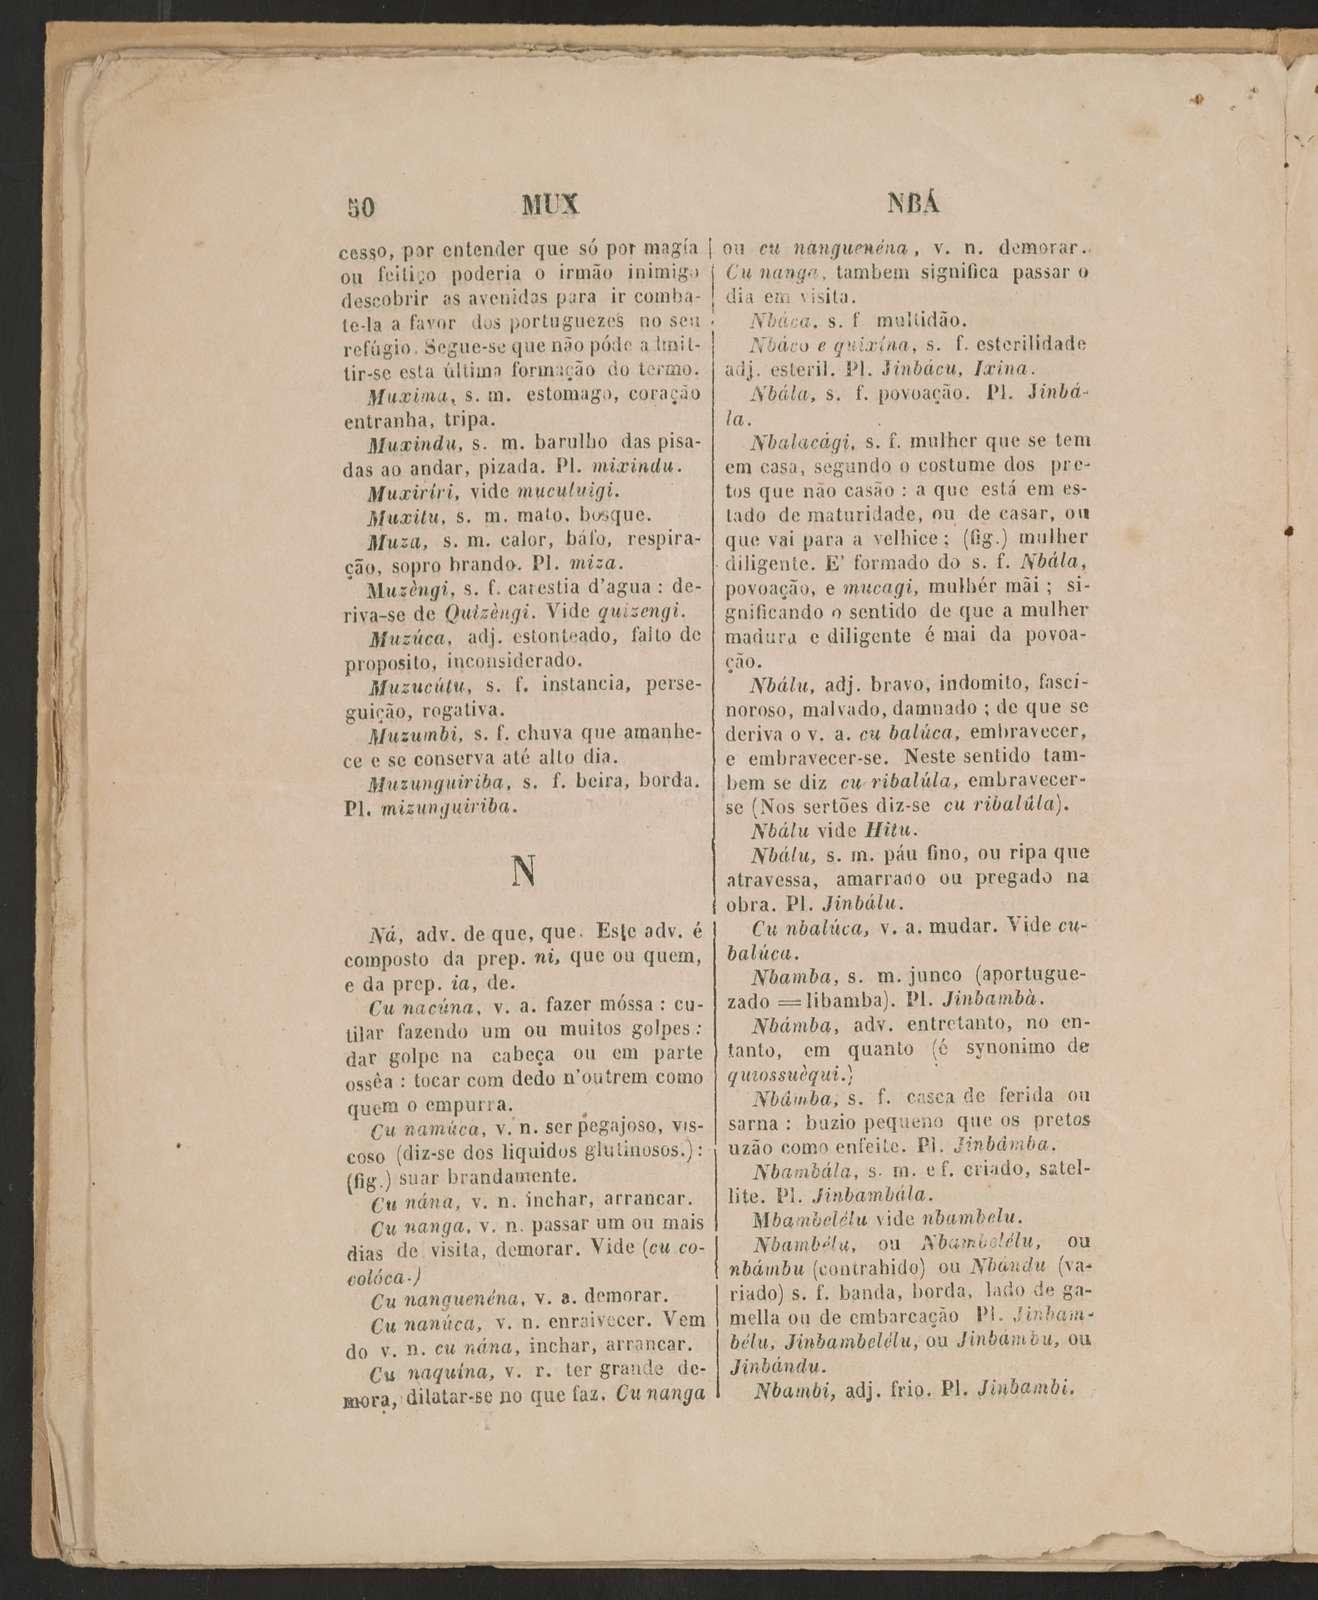 Diccionario da lingua nbundu ou ngolense ...